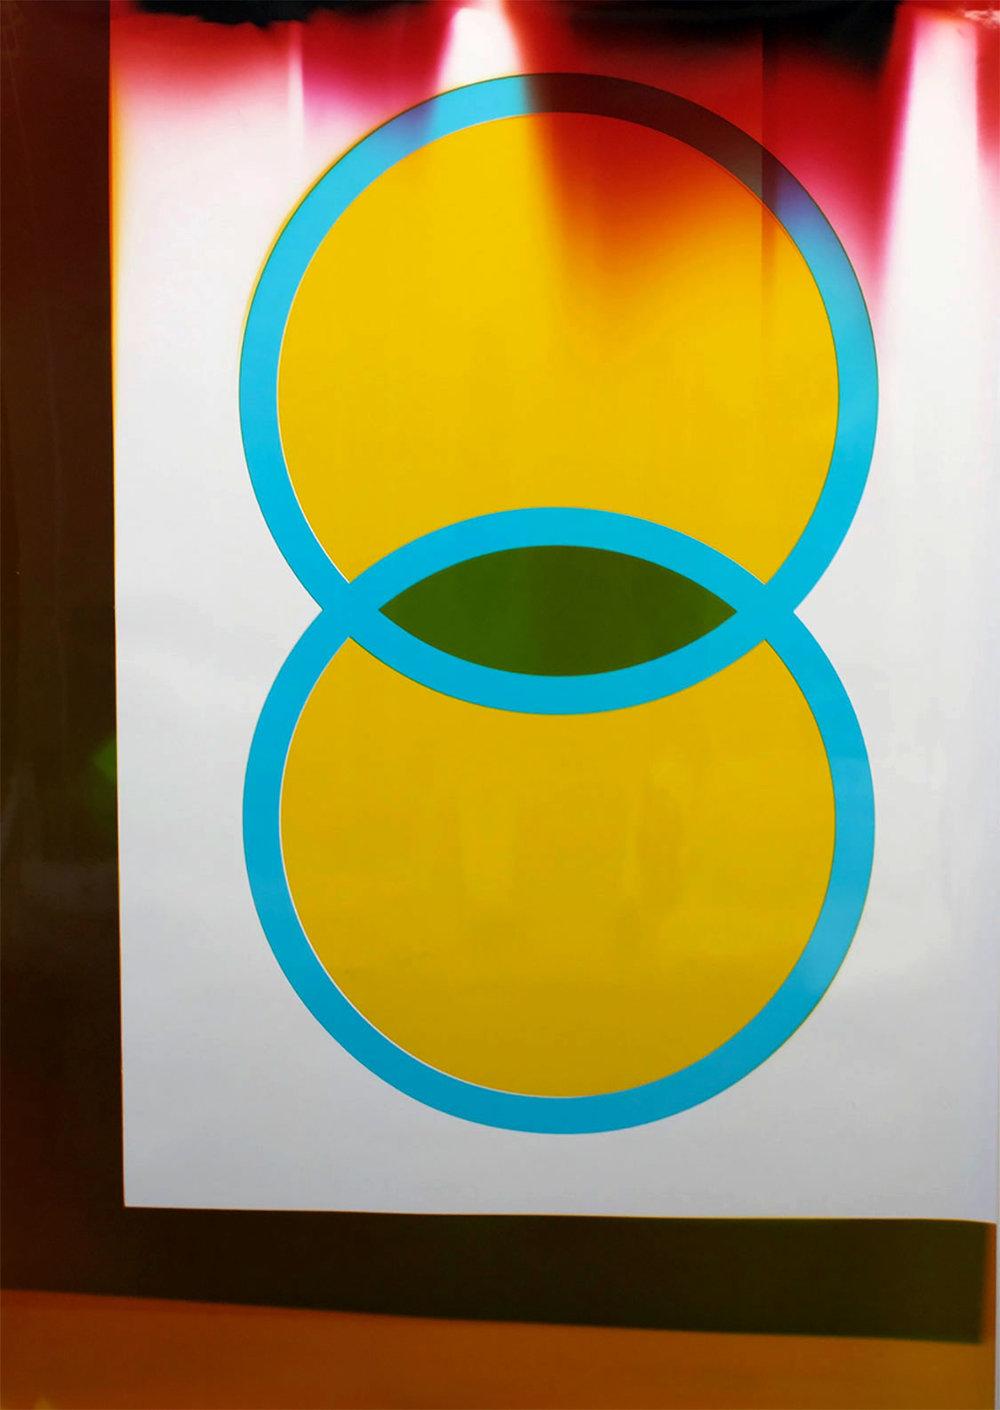 circles_for_web.jpg